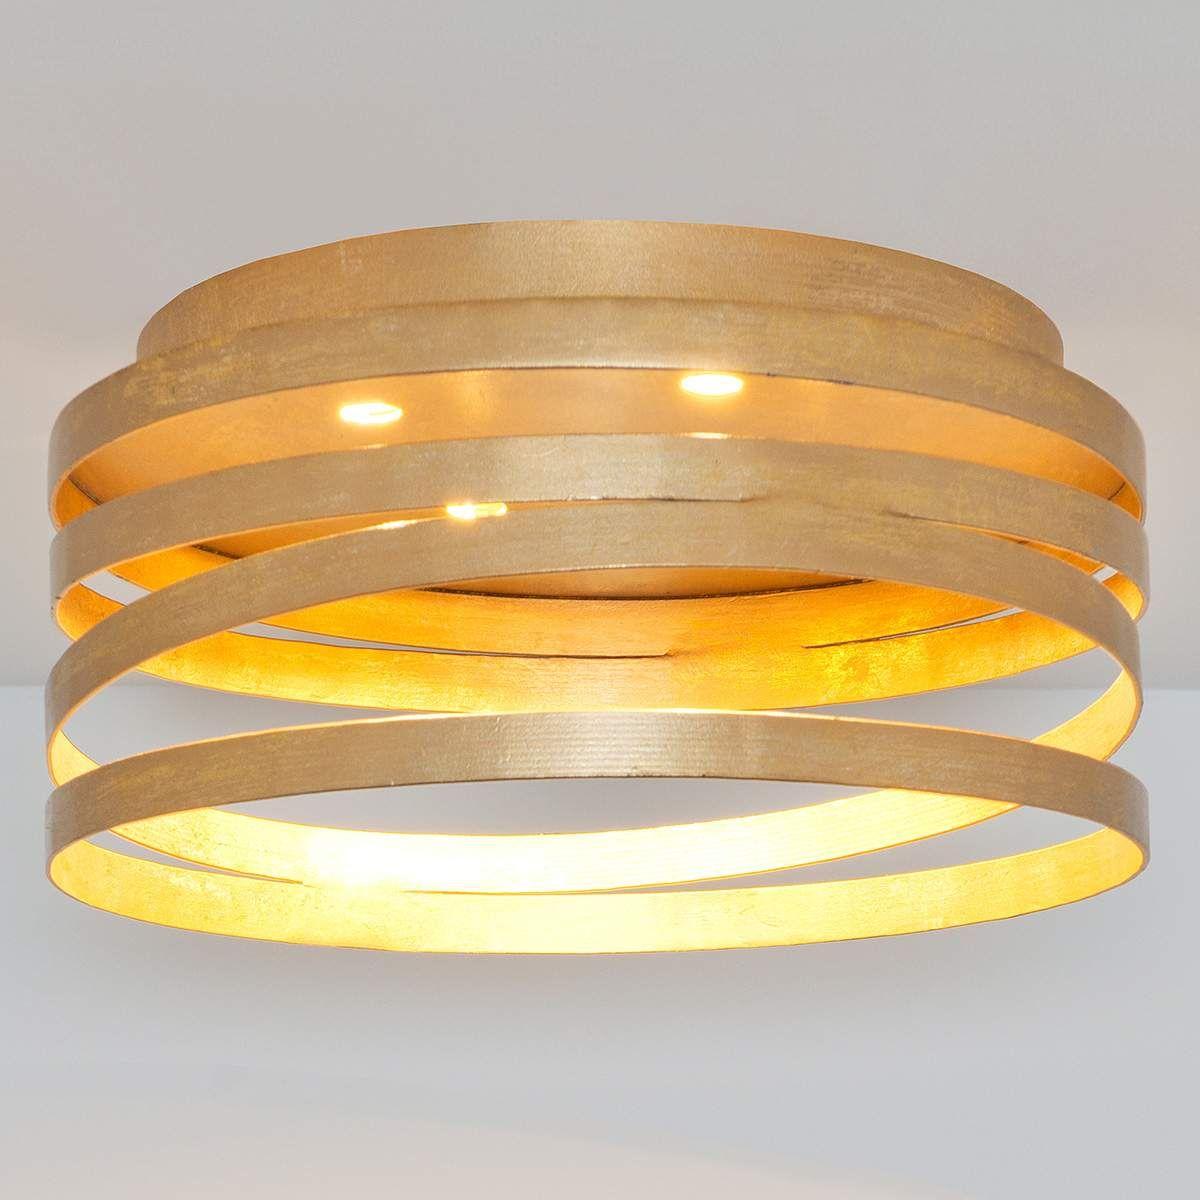 Designer Deckenleuchten Wohnzimmer Led Deckenstrahler 230v Dimmbar Moderne Kristall Lampen Deckenle Led Deckenleuchte Led Deckenstrahler Led Deckenlampen